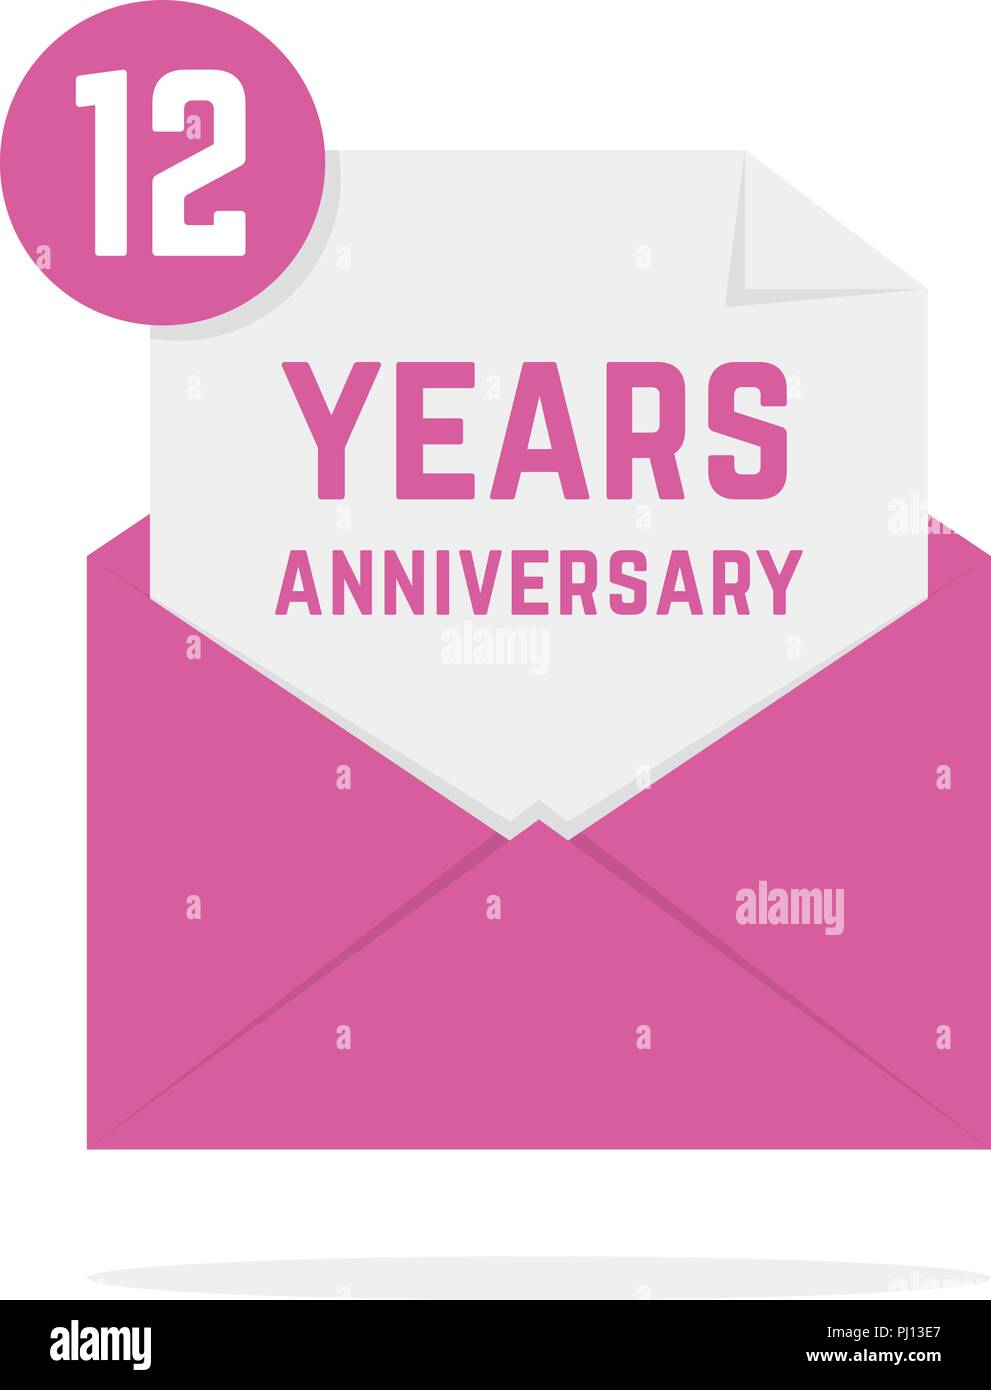 12 Anniversario Matrimonio.12 Years Anniversary Icon In Open Letter Stock Vector Art